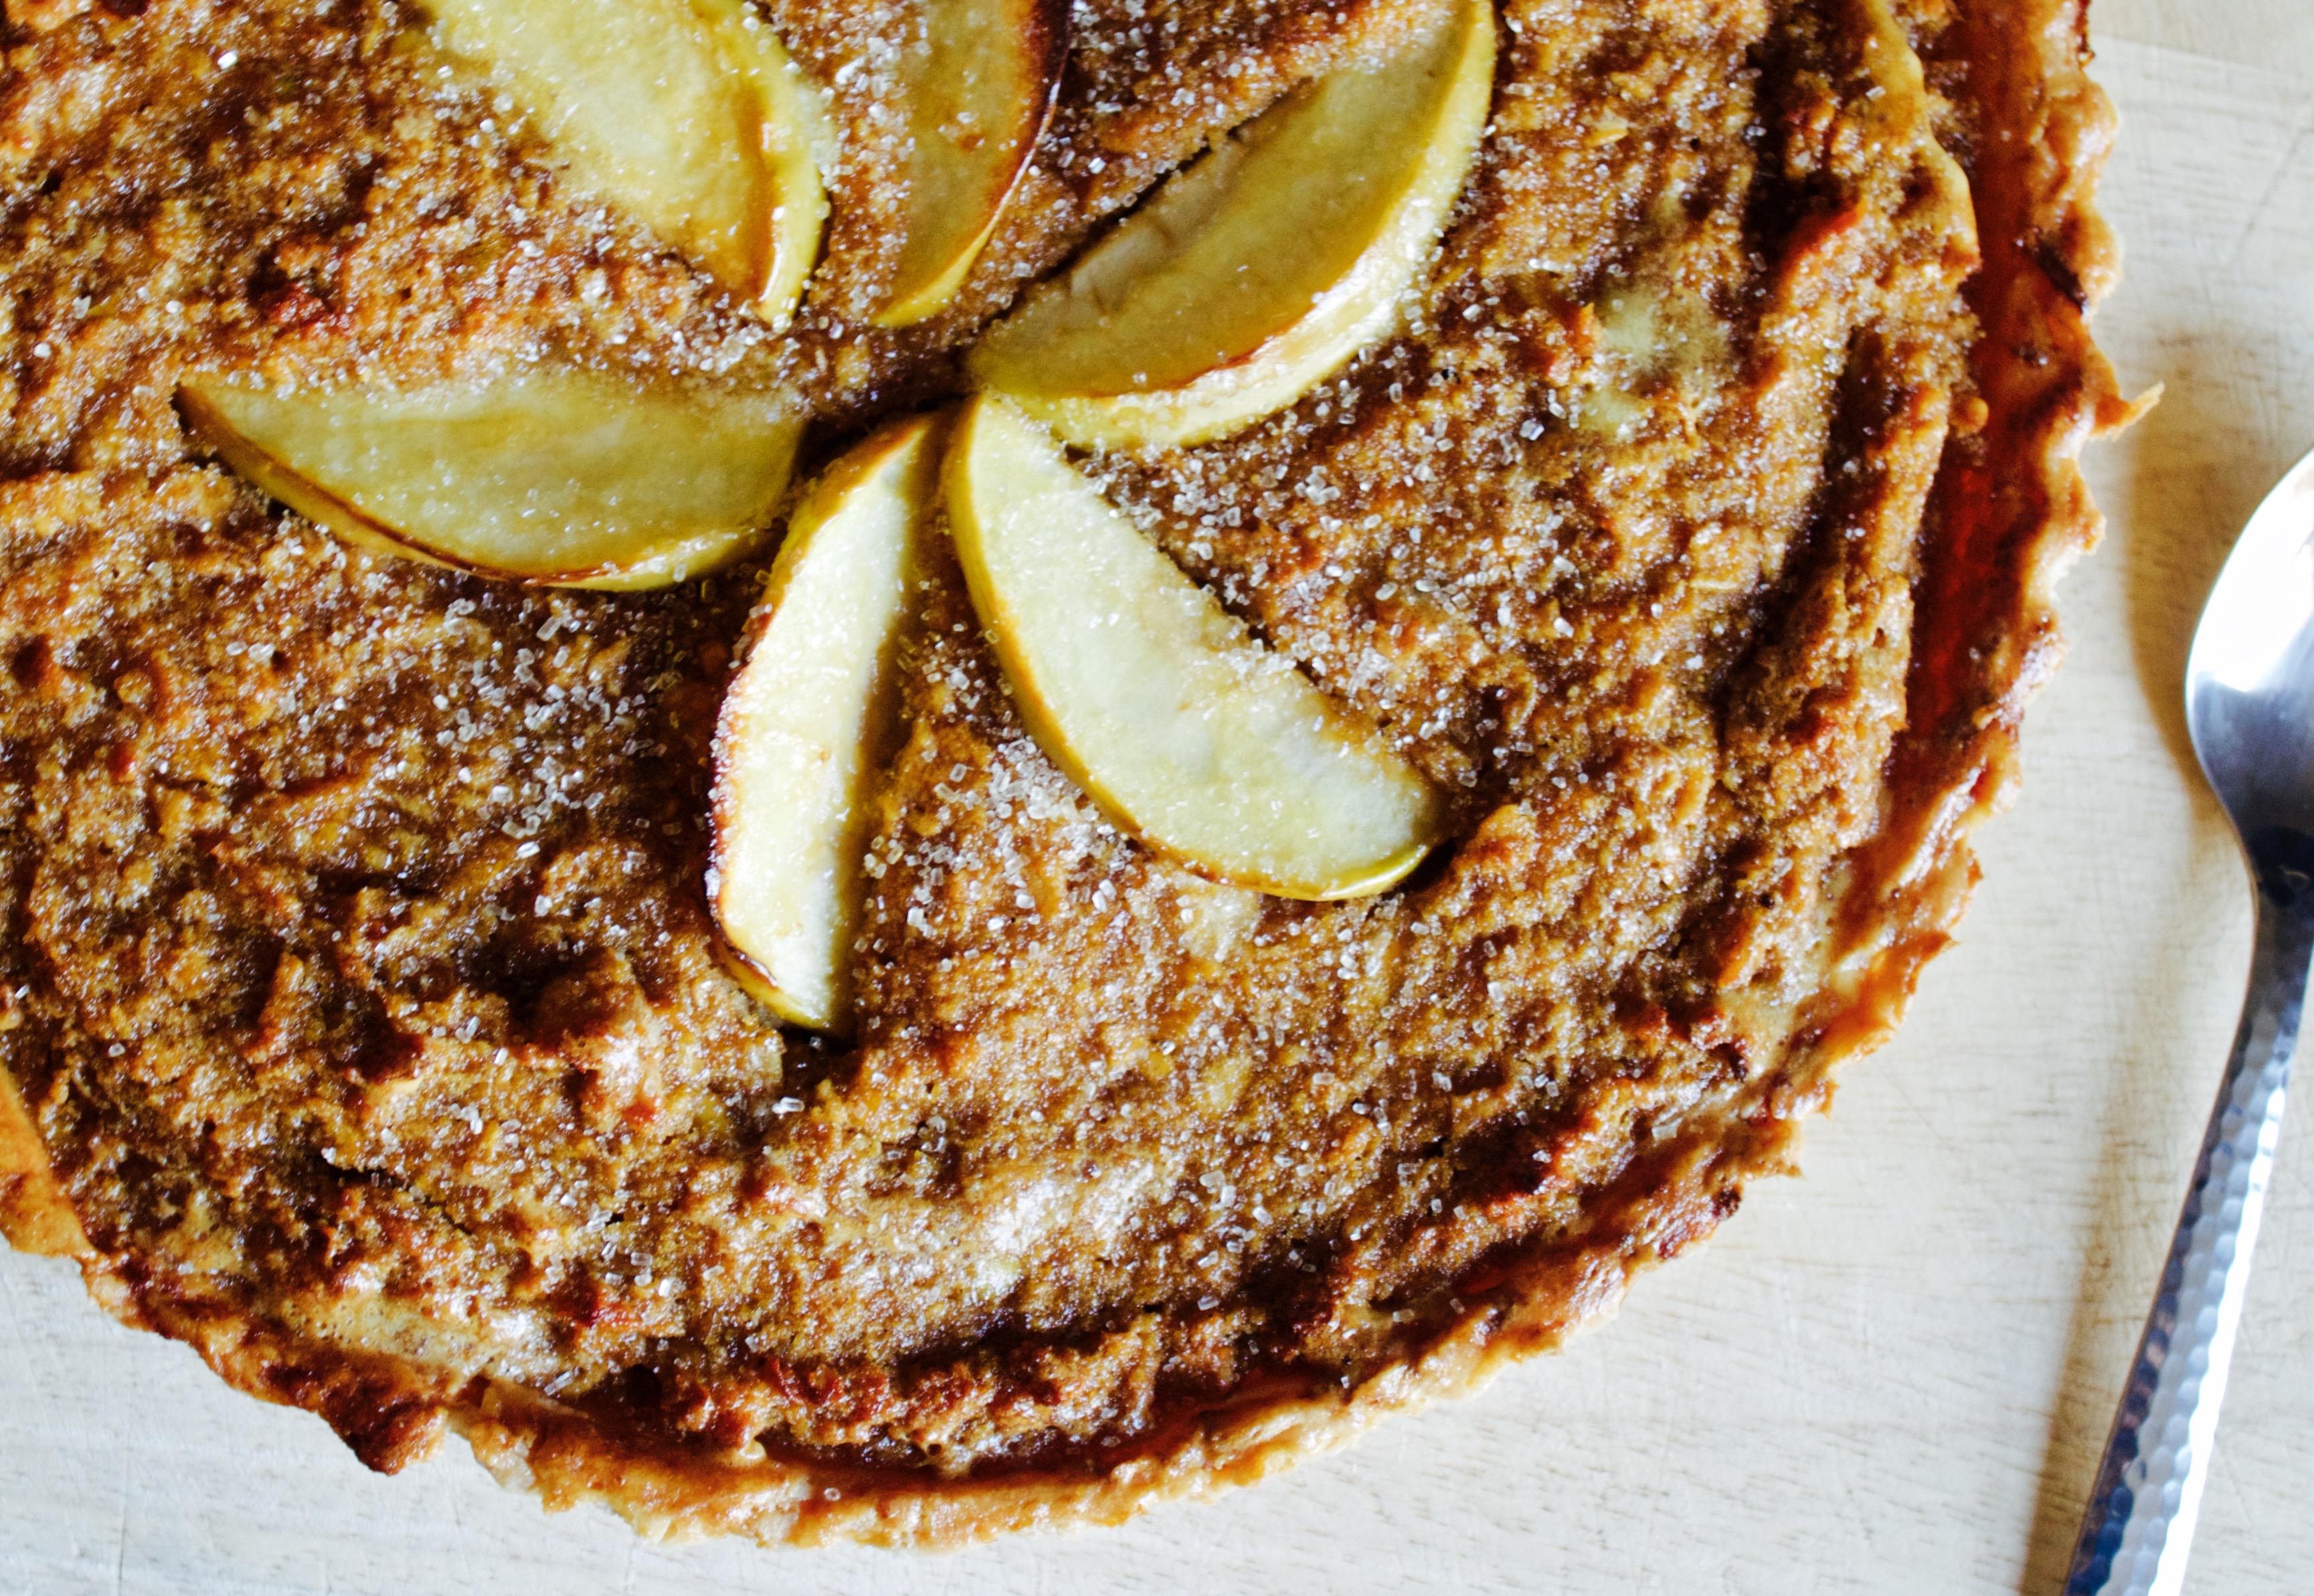 Gluten Free, Spiced, Cider, Apple, Treacle Tart